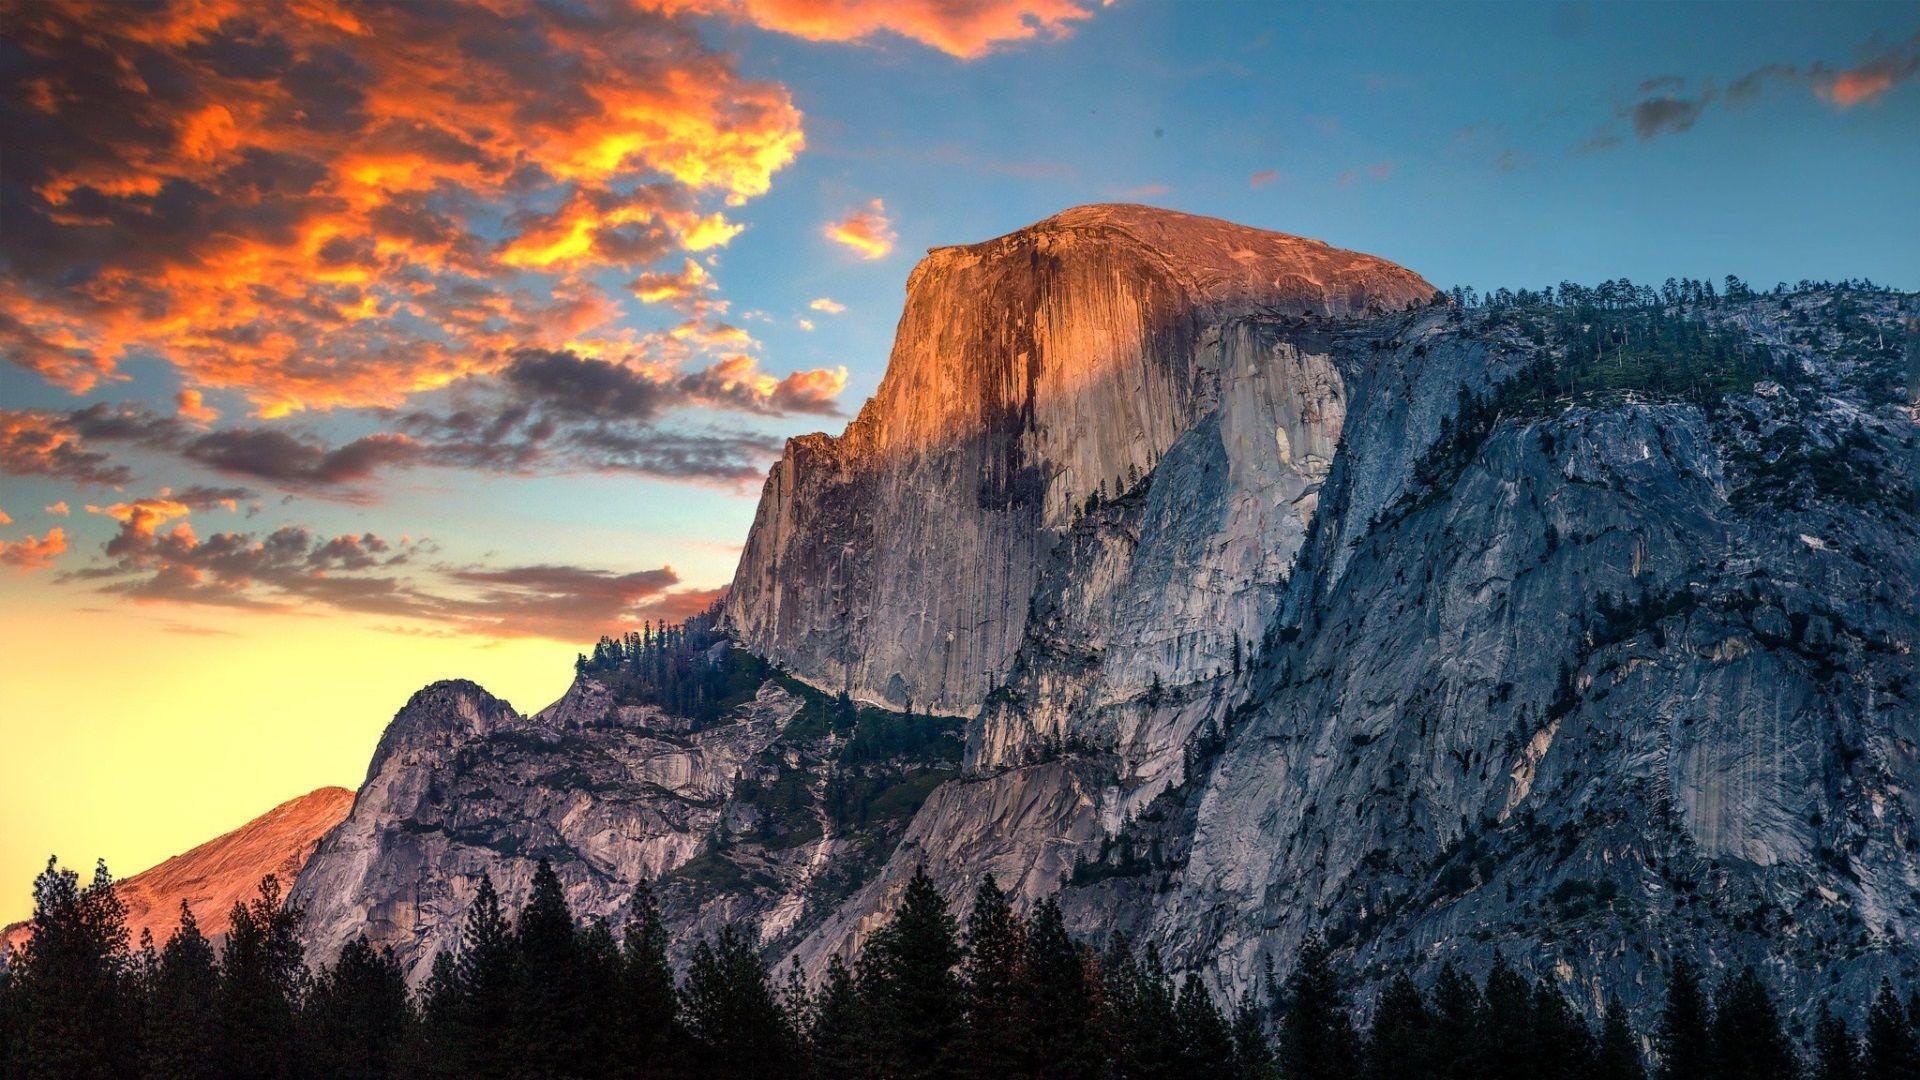 1920 X 1080 Yosemite Wallpapers Top Free 1920 X 1080 Yosemite Backgrounds Wallpaperaccess